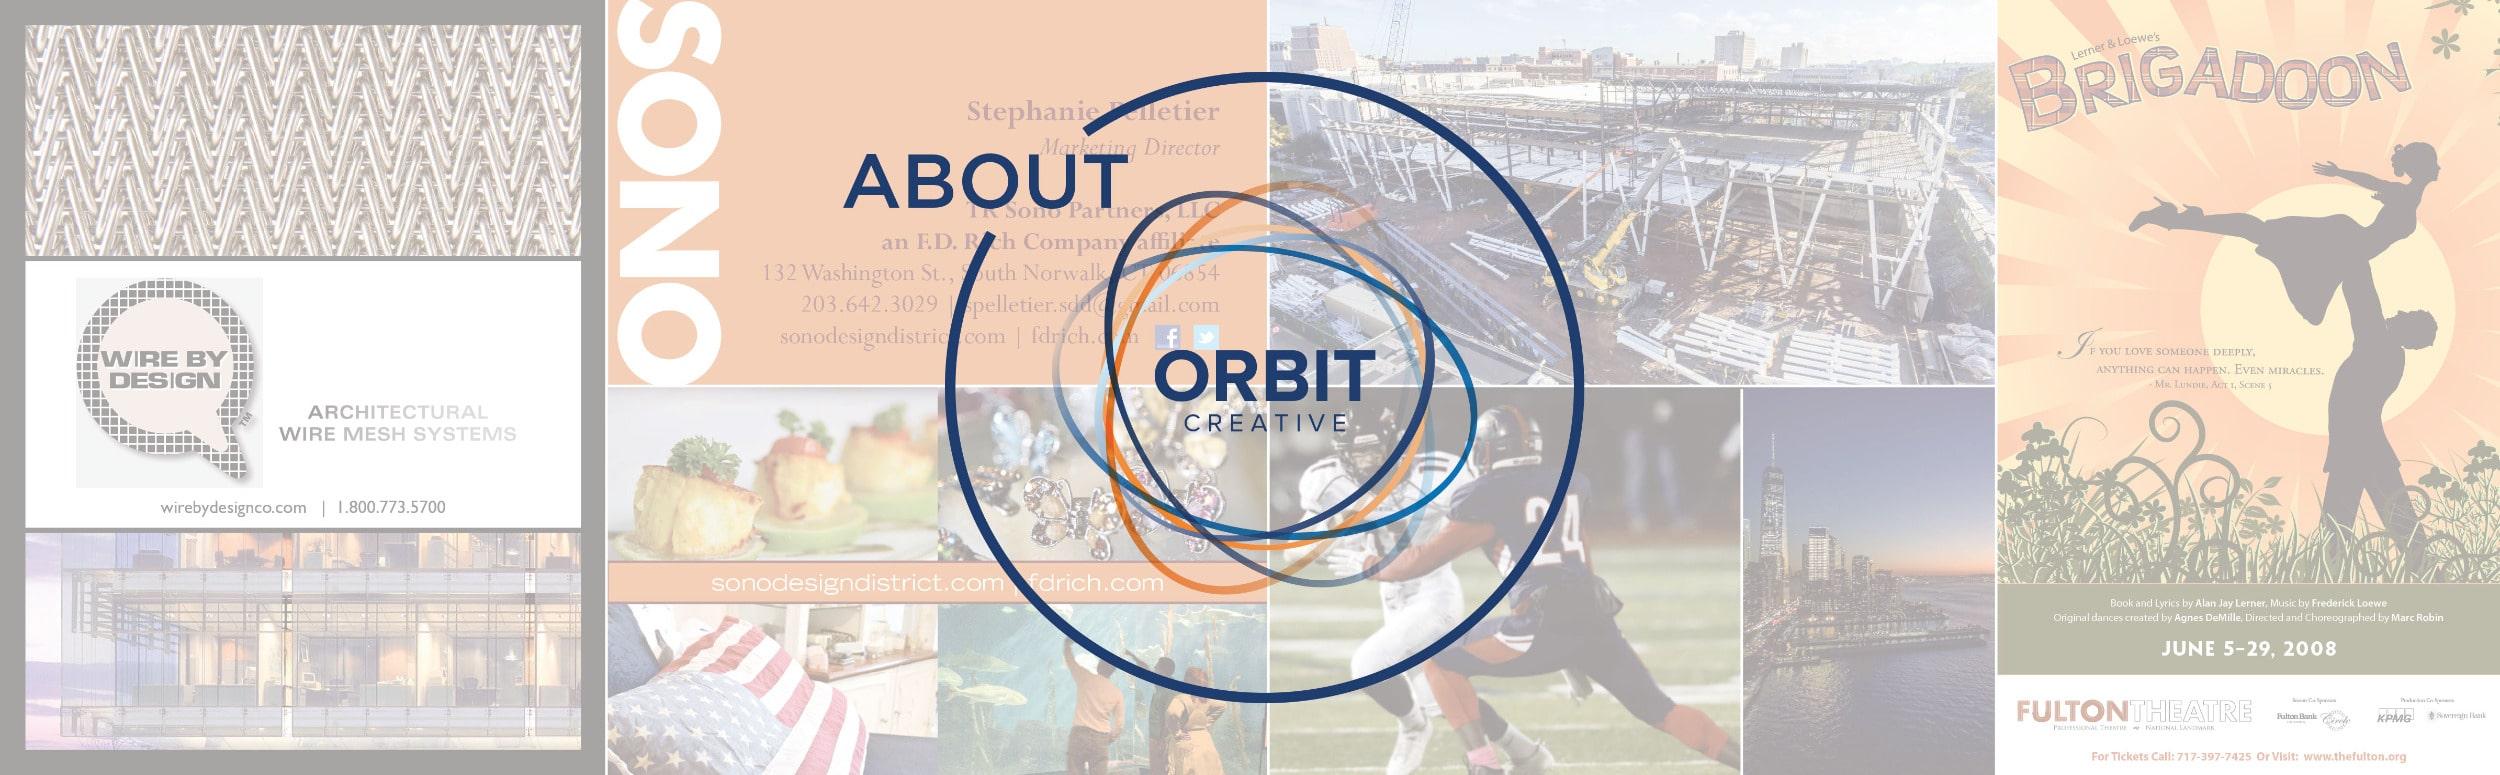 Orbit Creative About Us